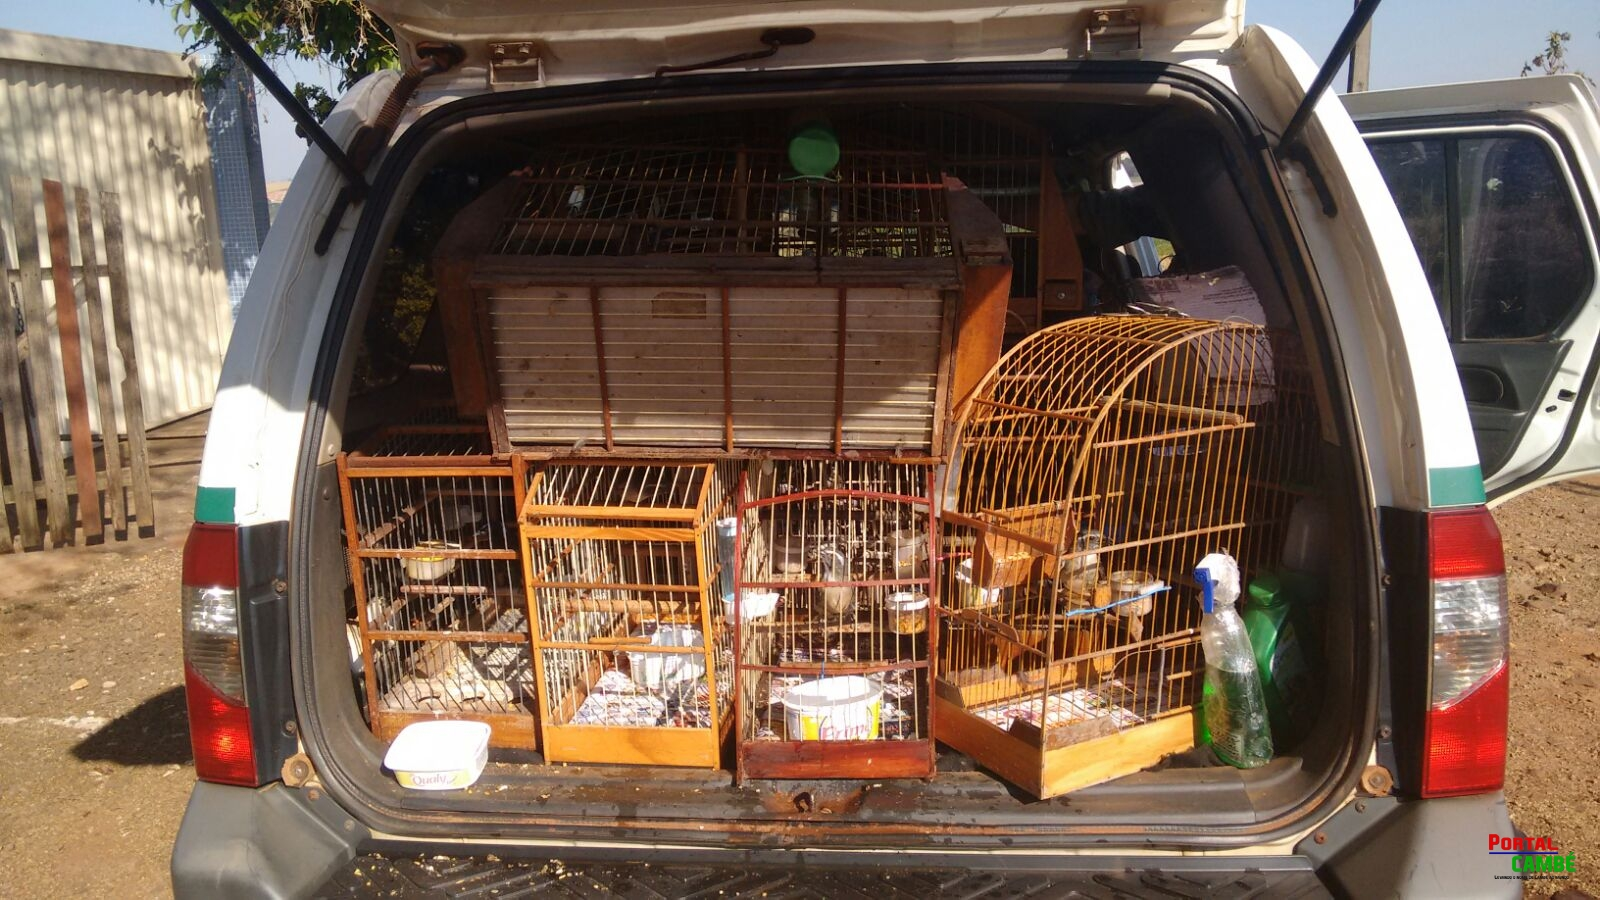 Polícia Ambiental apreende 42 pássaros silvestres em Apucarana